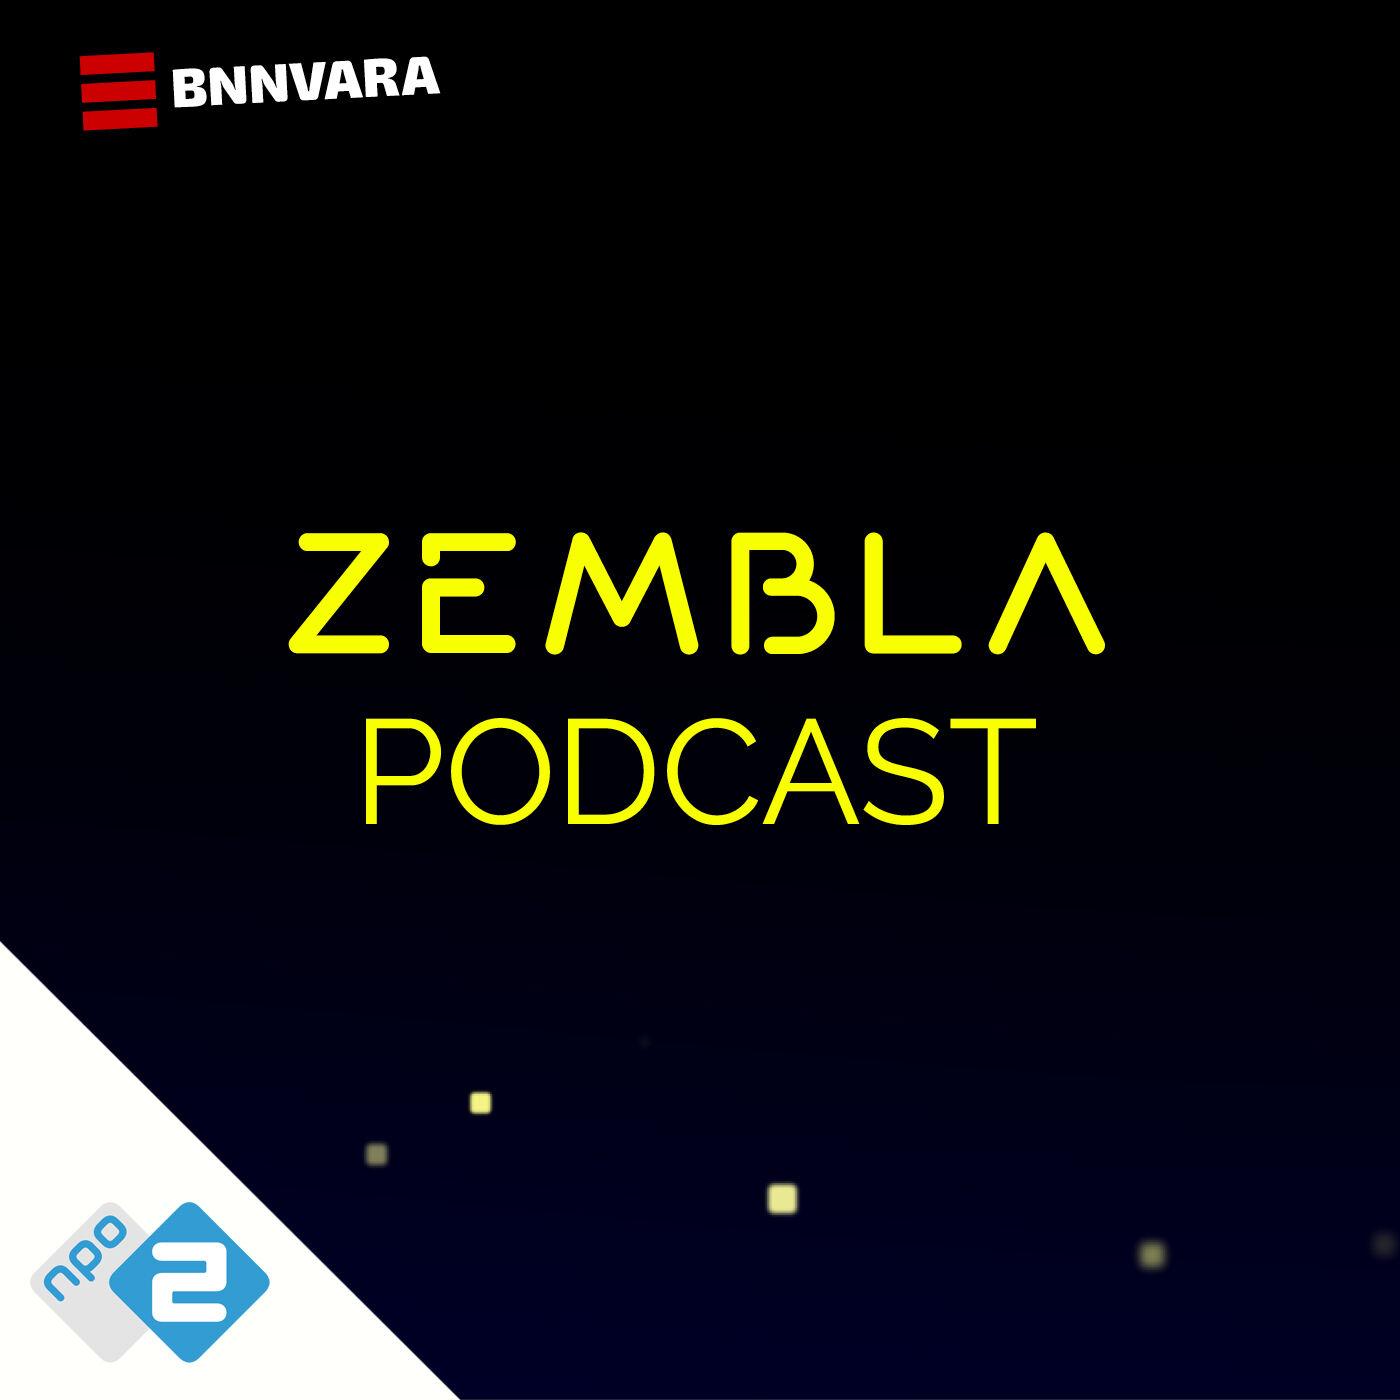 Zembla podcast logo